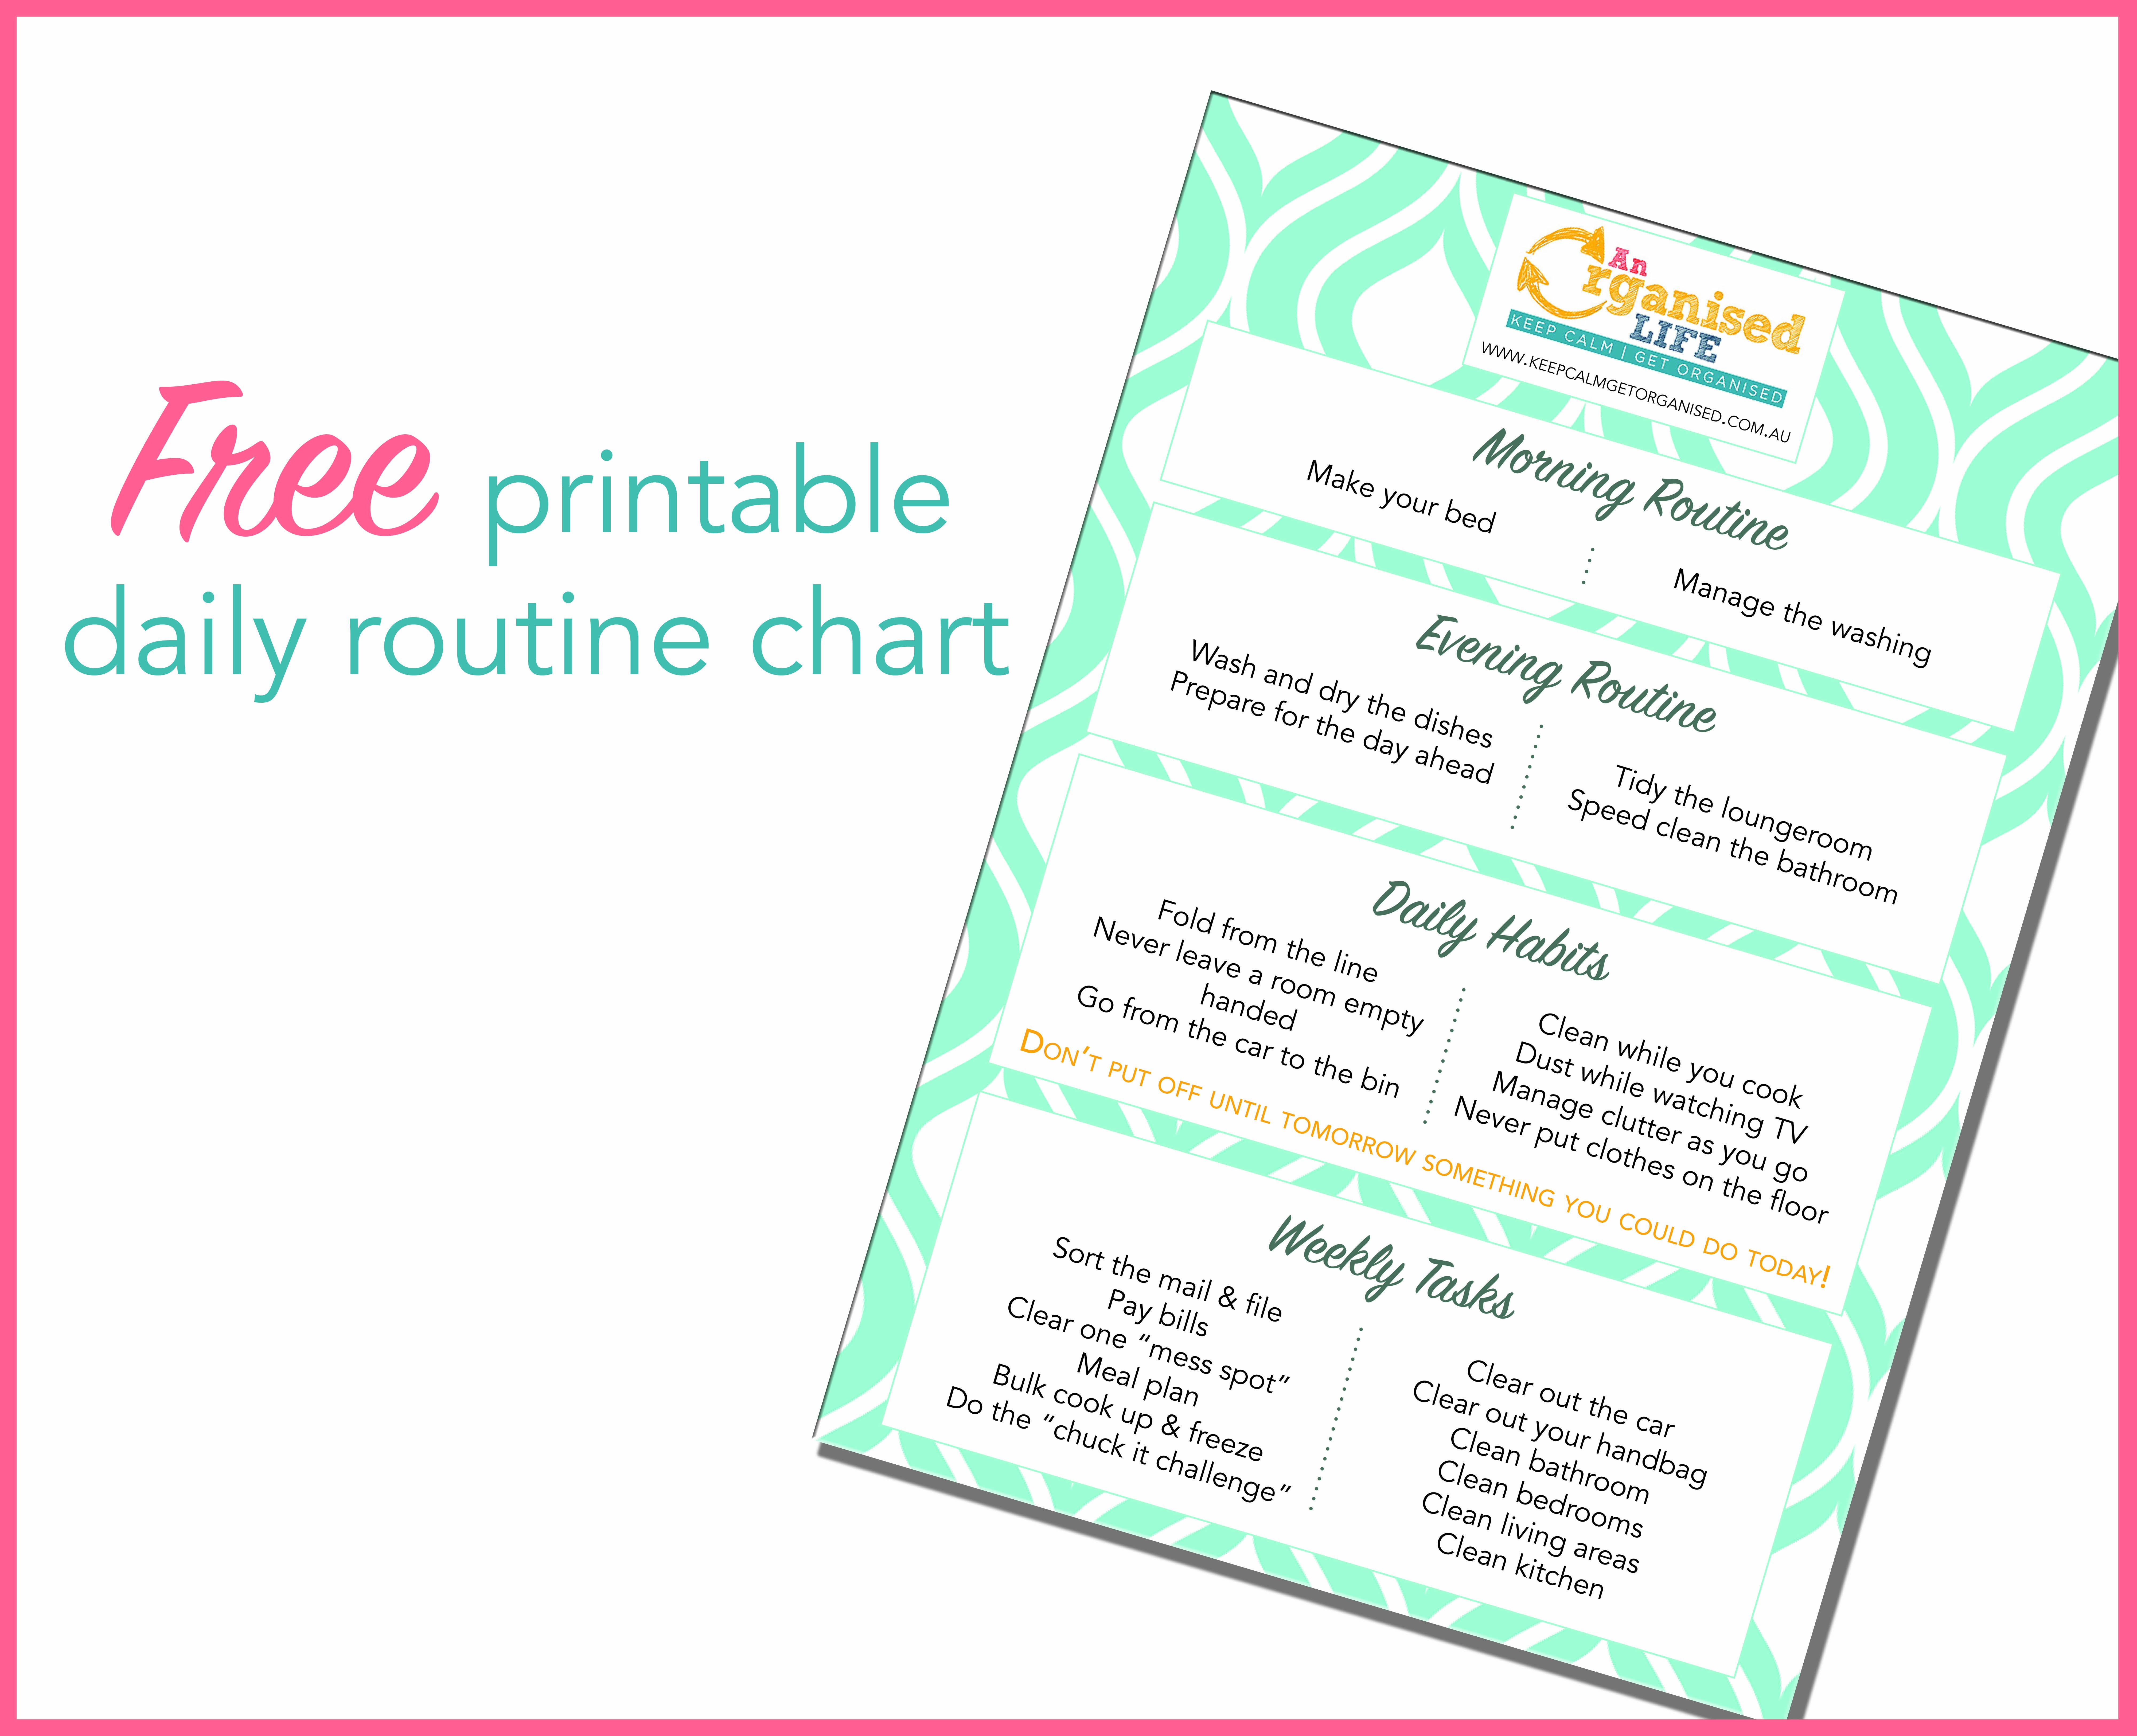 Free Printable Daily Routine Chart | Keep Calm Get Organised - Free Printable Morning Routine Chart